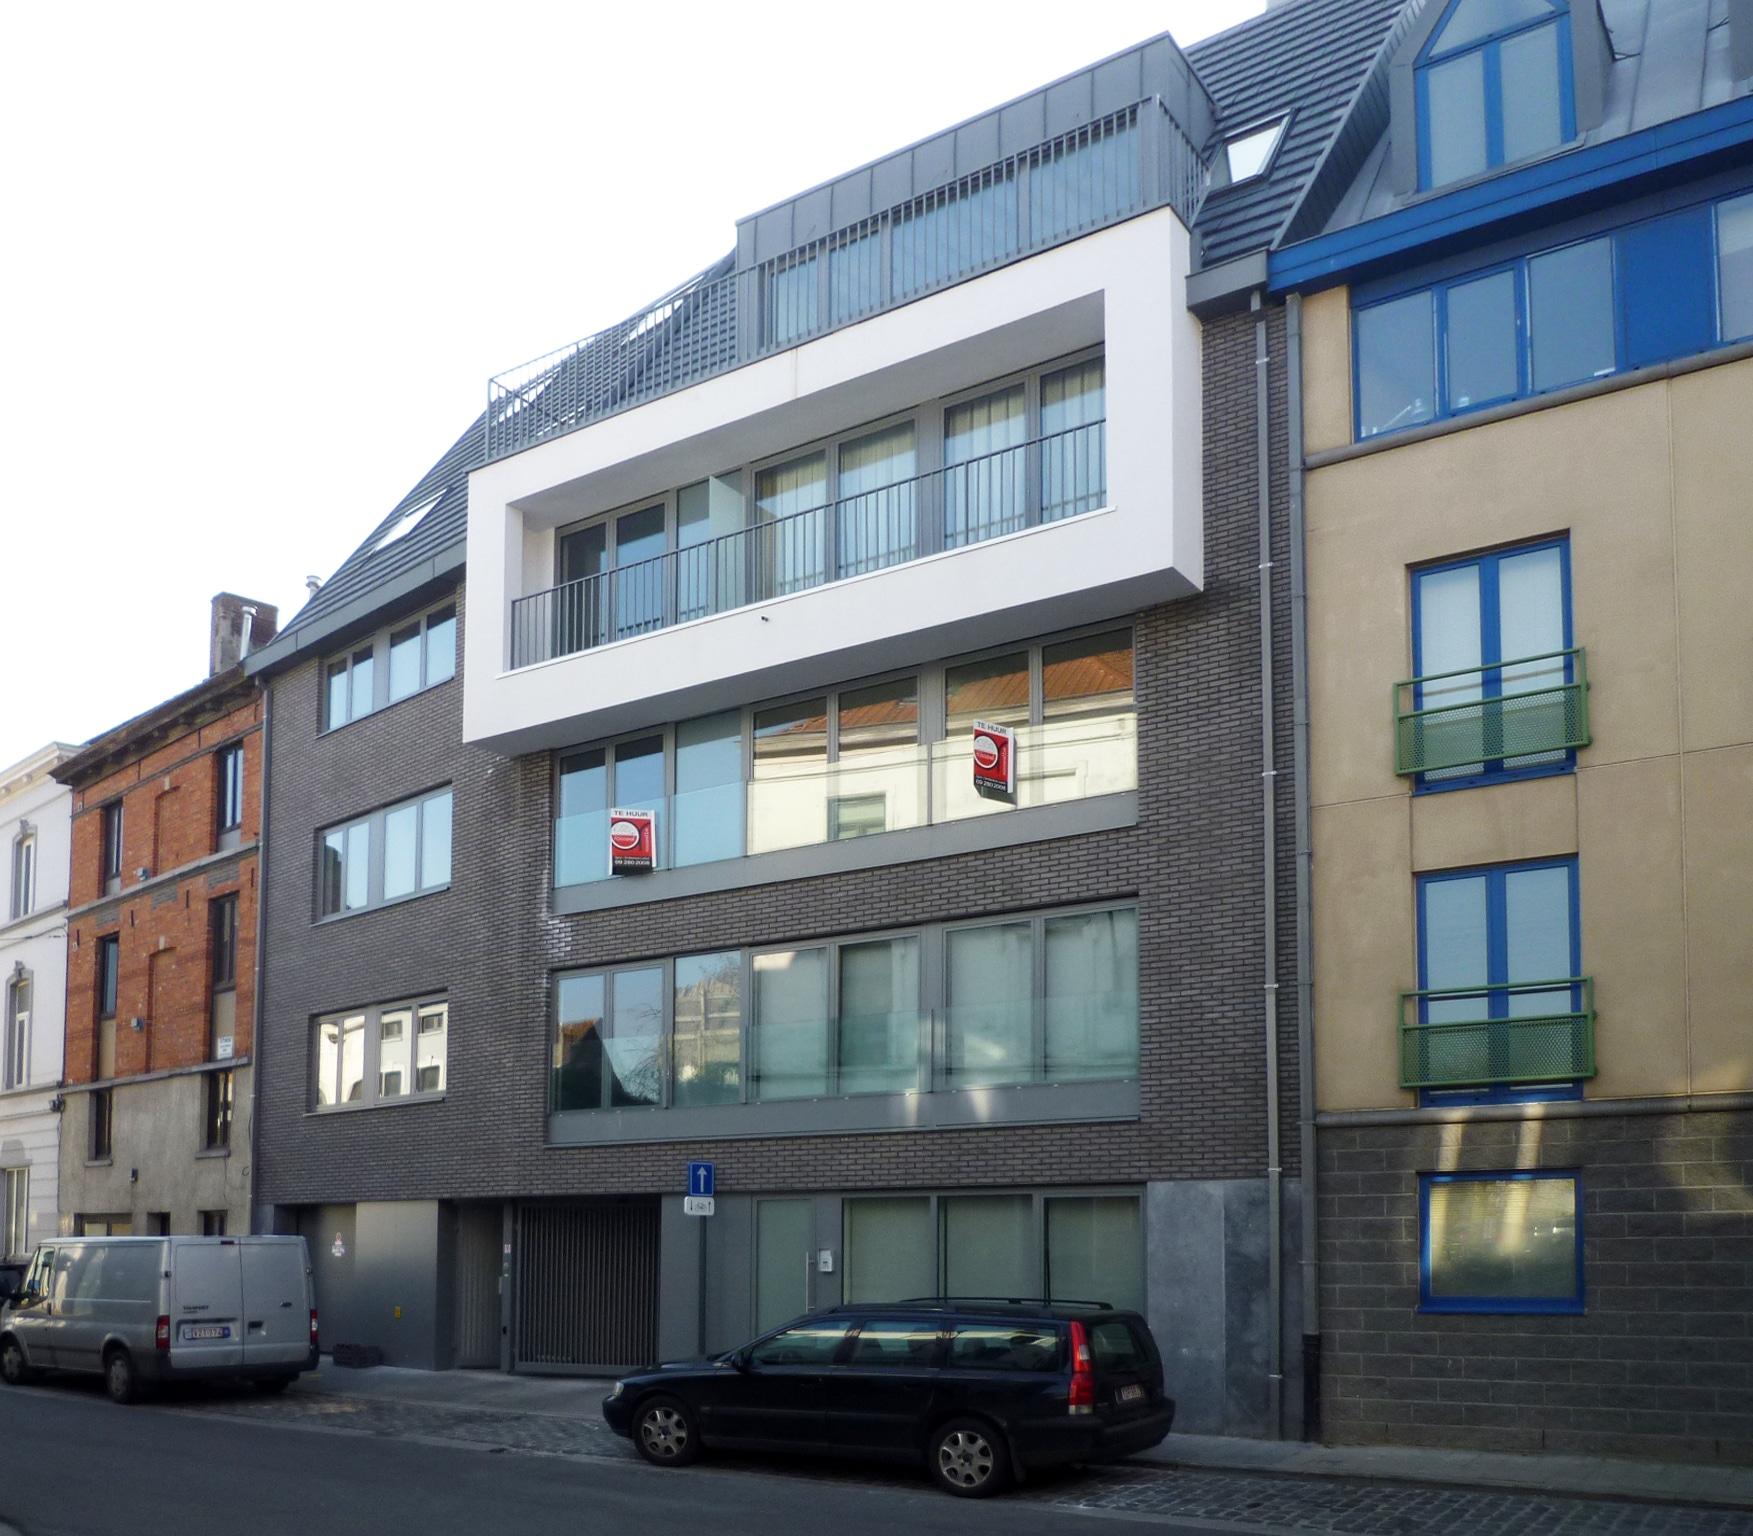 ack1 | Baeyens & Beck architecten Gent | architect nieuwbouw renovatie interieur | high end | architectenbureau